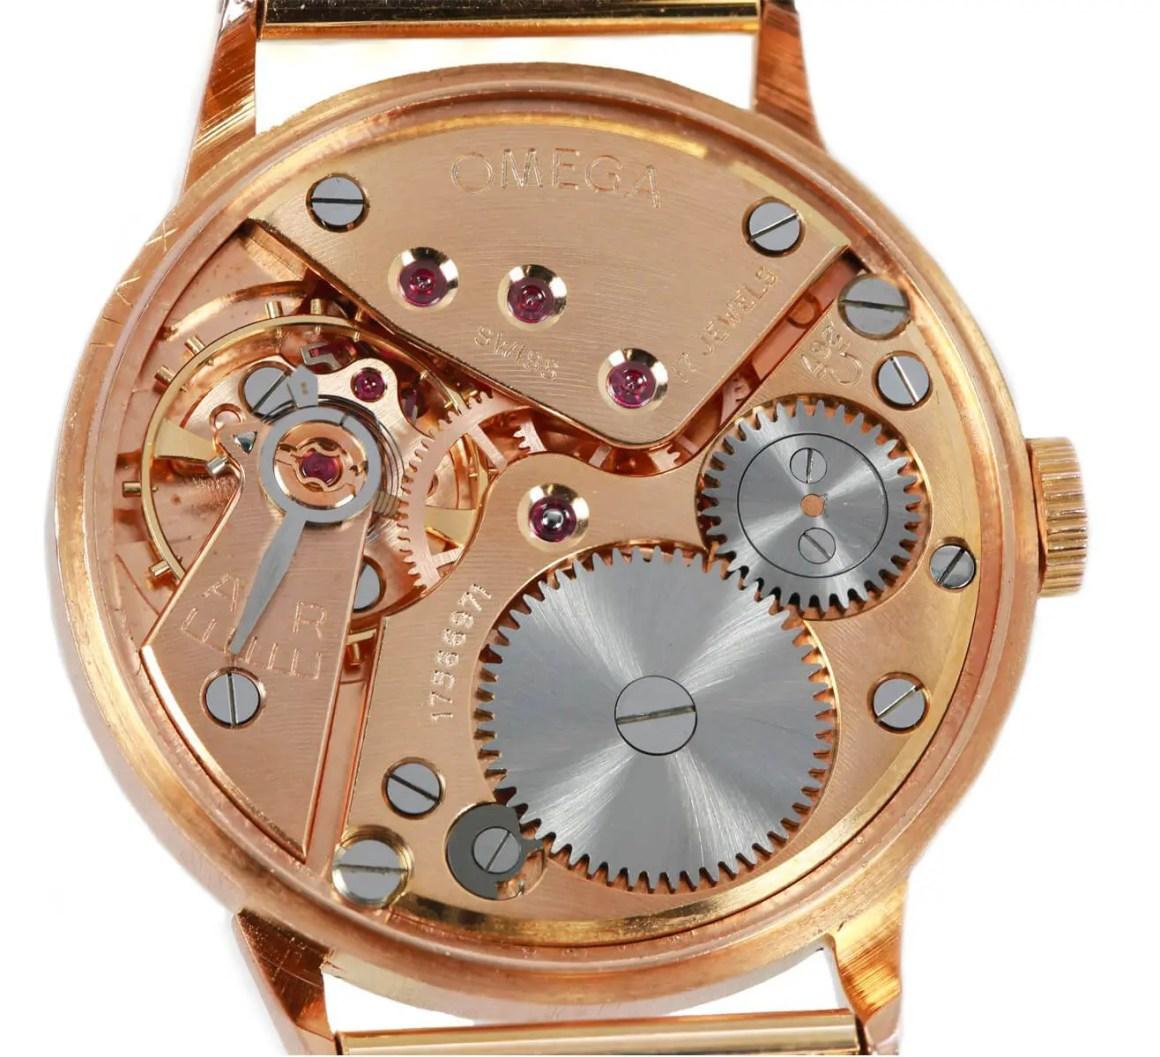 Vintage 18ct Gold Omega Watch - Ape to Gentleman